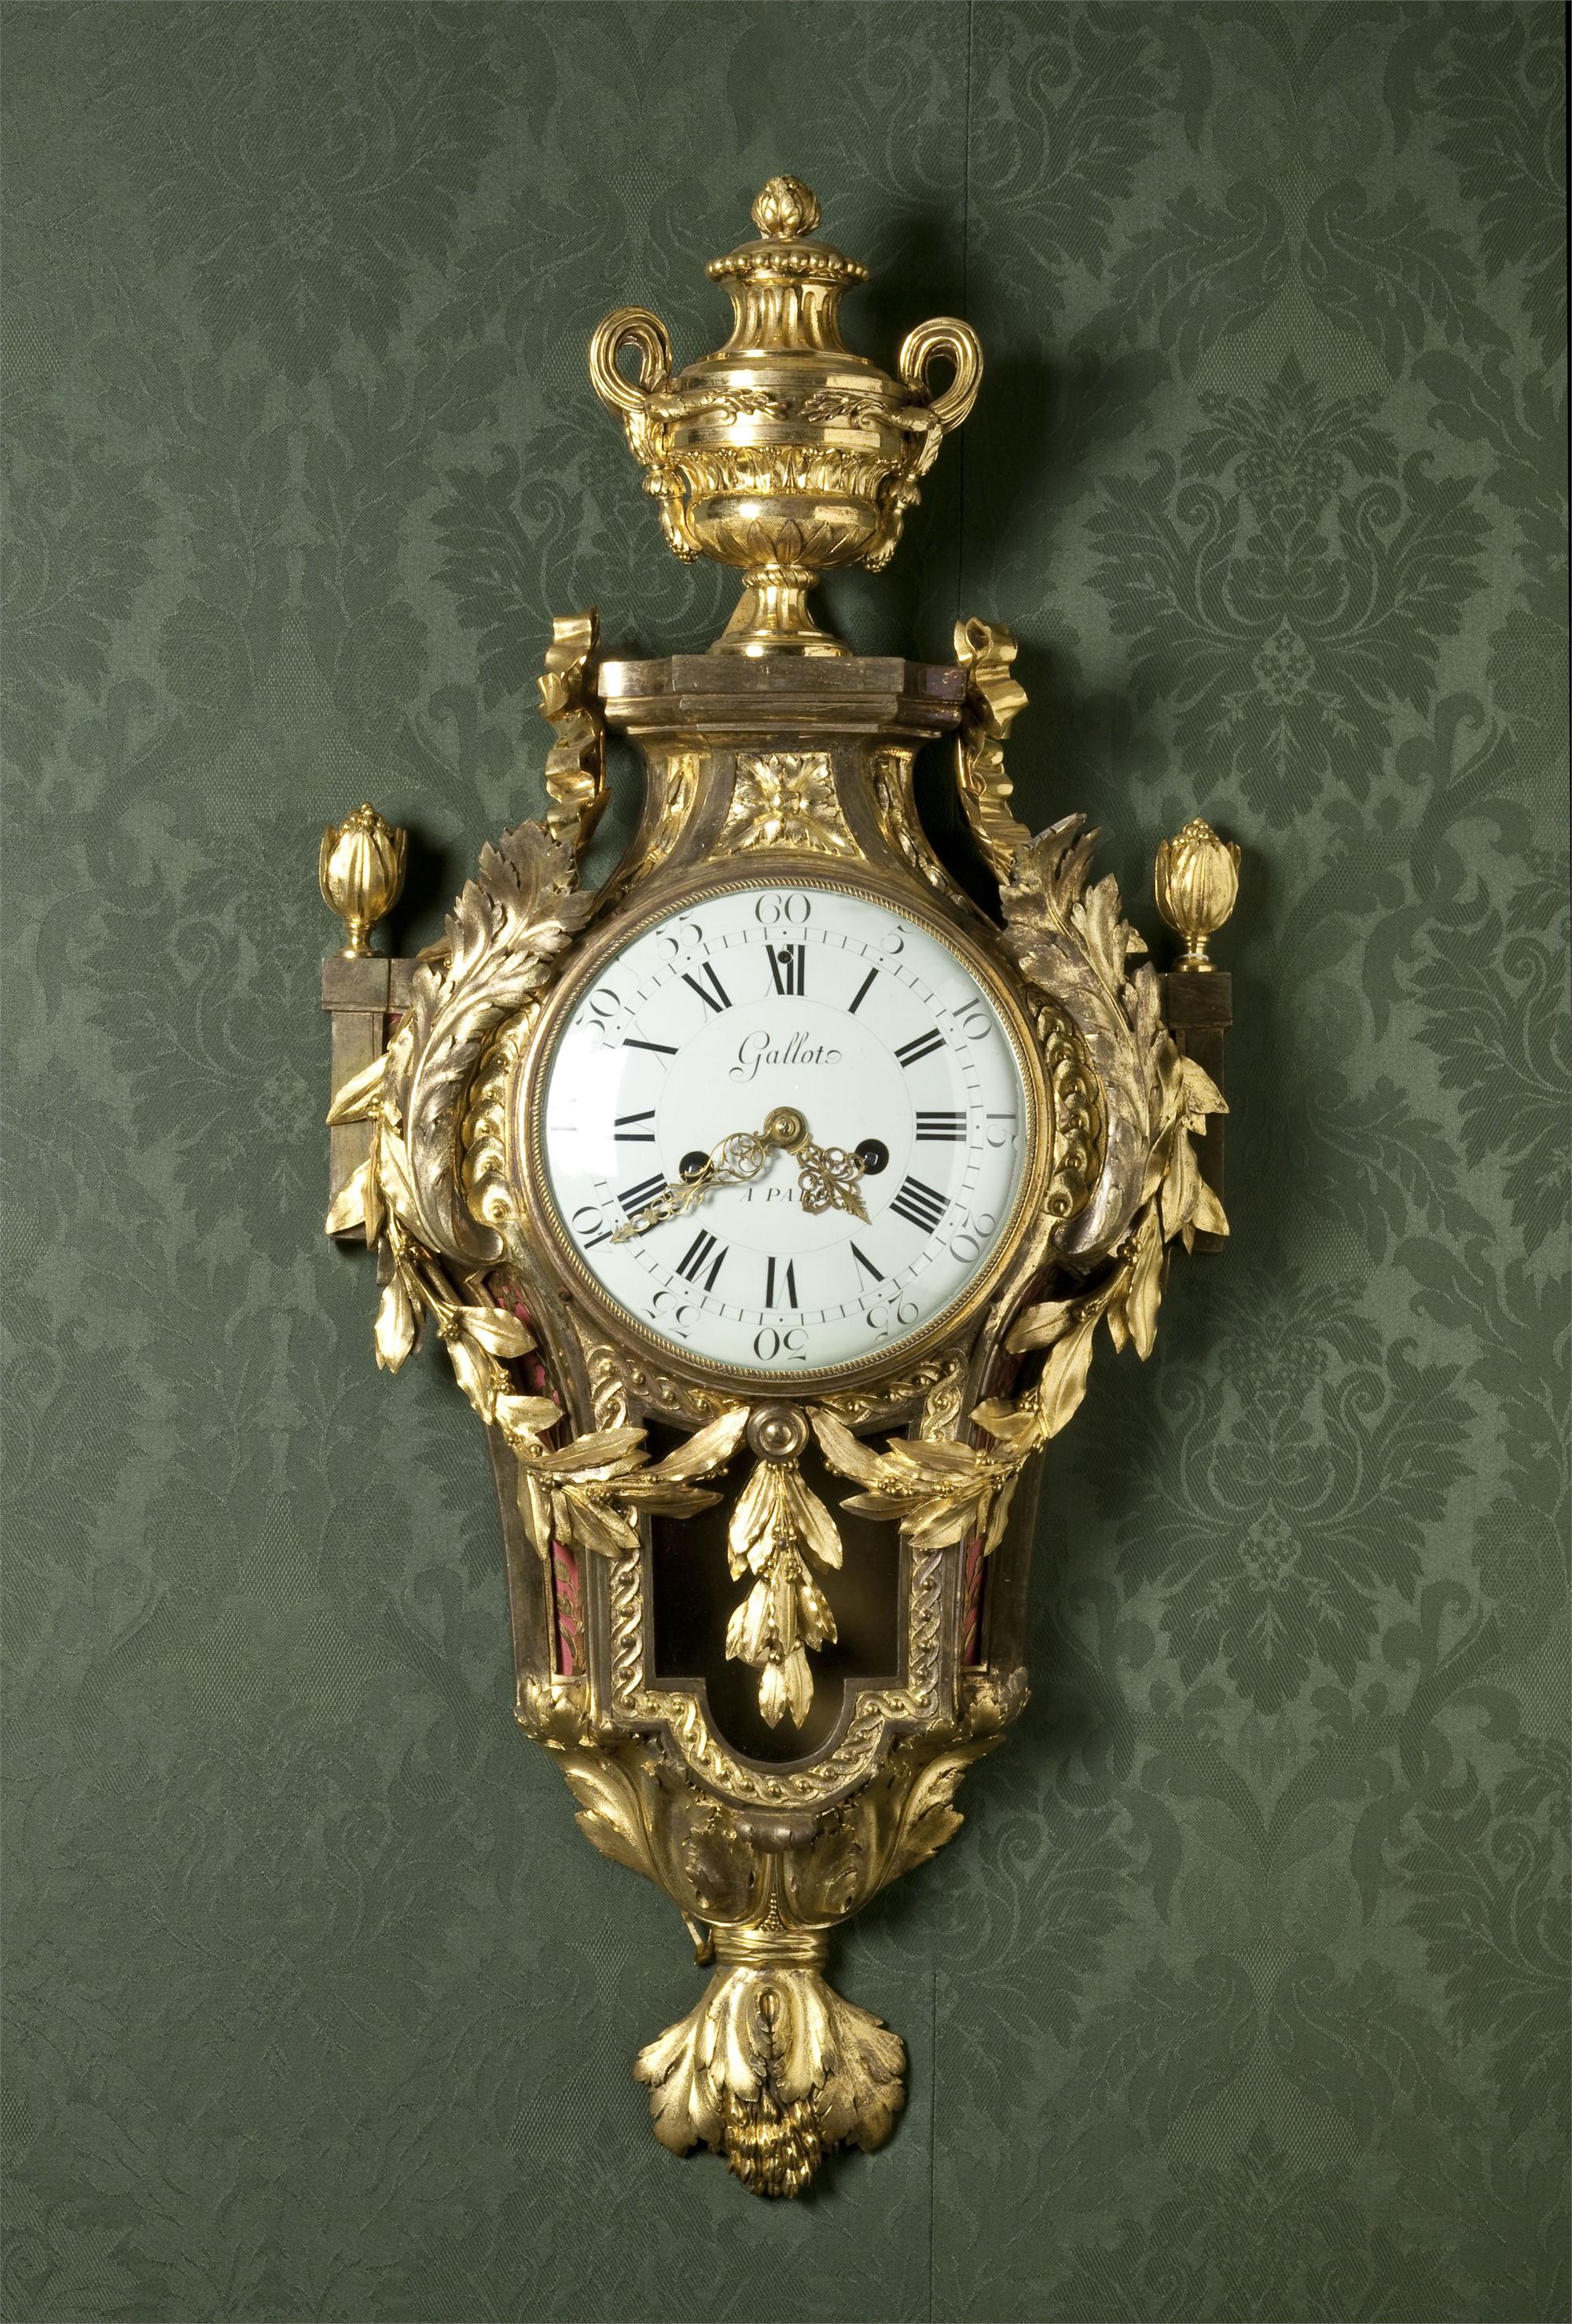 LOUIS XVI ORMOLU CARTEL CLOCK, MOVEMENT SIGNED GALLOT